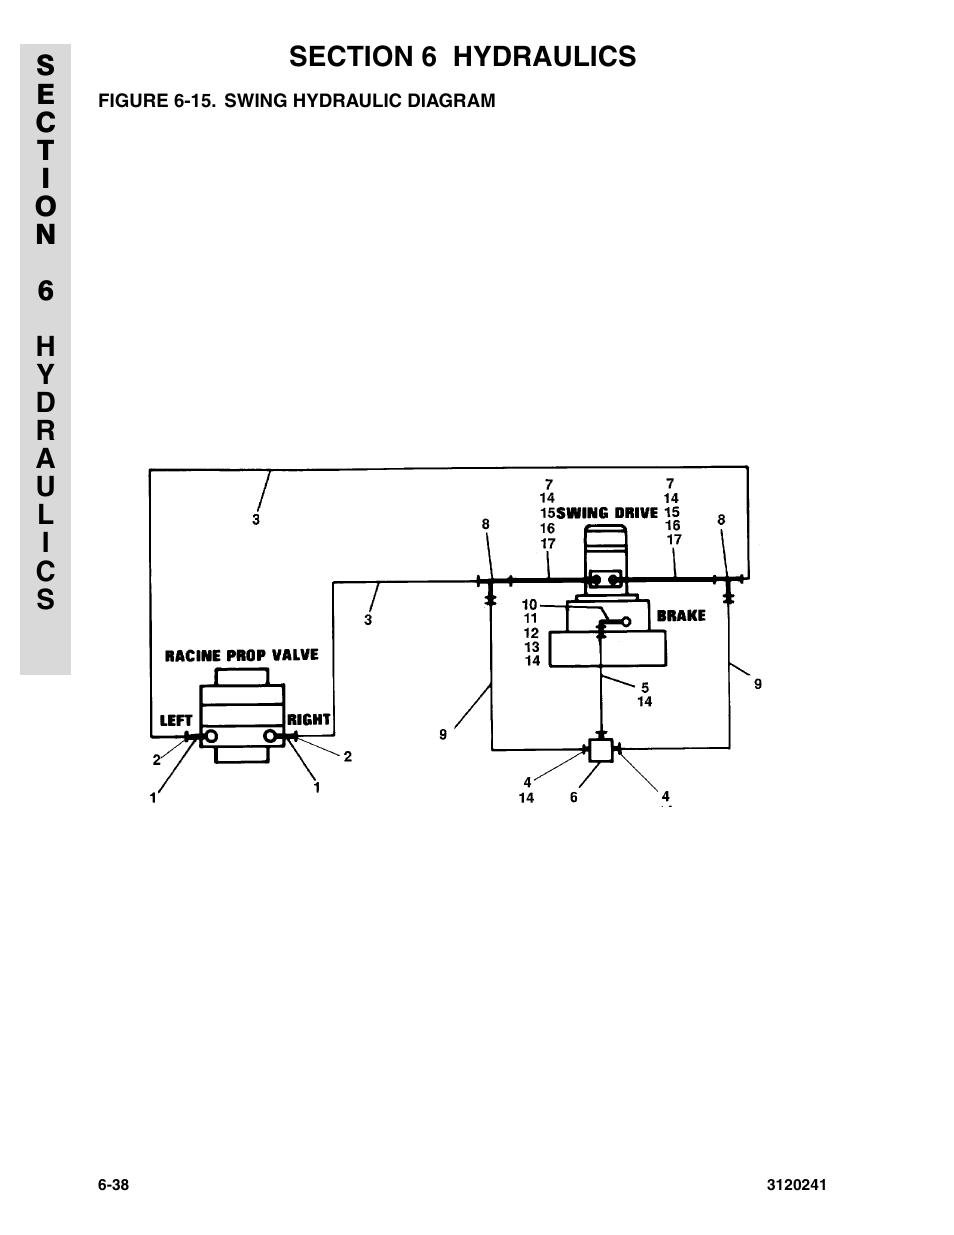 figure 6 15 swing hydraulic diagram jlg 40h parts. Black Bedroom Furniture Sets. Home Design Ideas